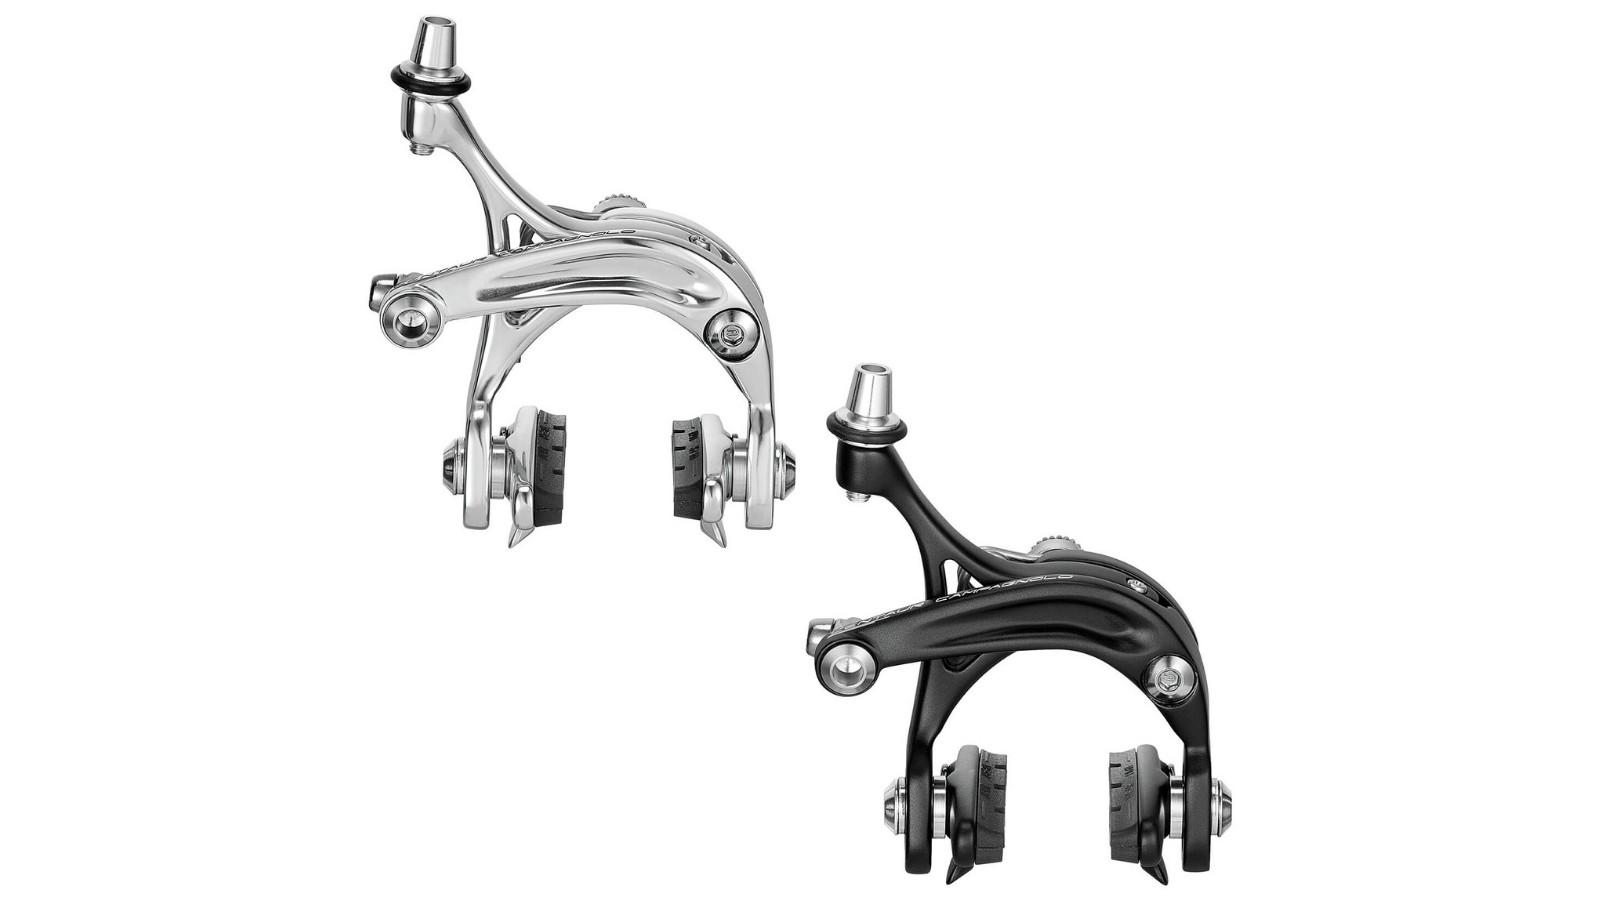 Choose between black or silver dual-pivot brake sets...